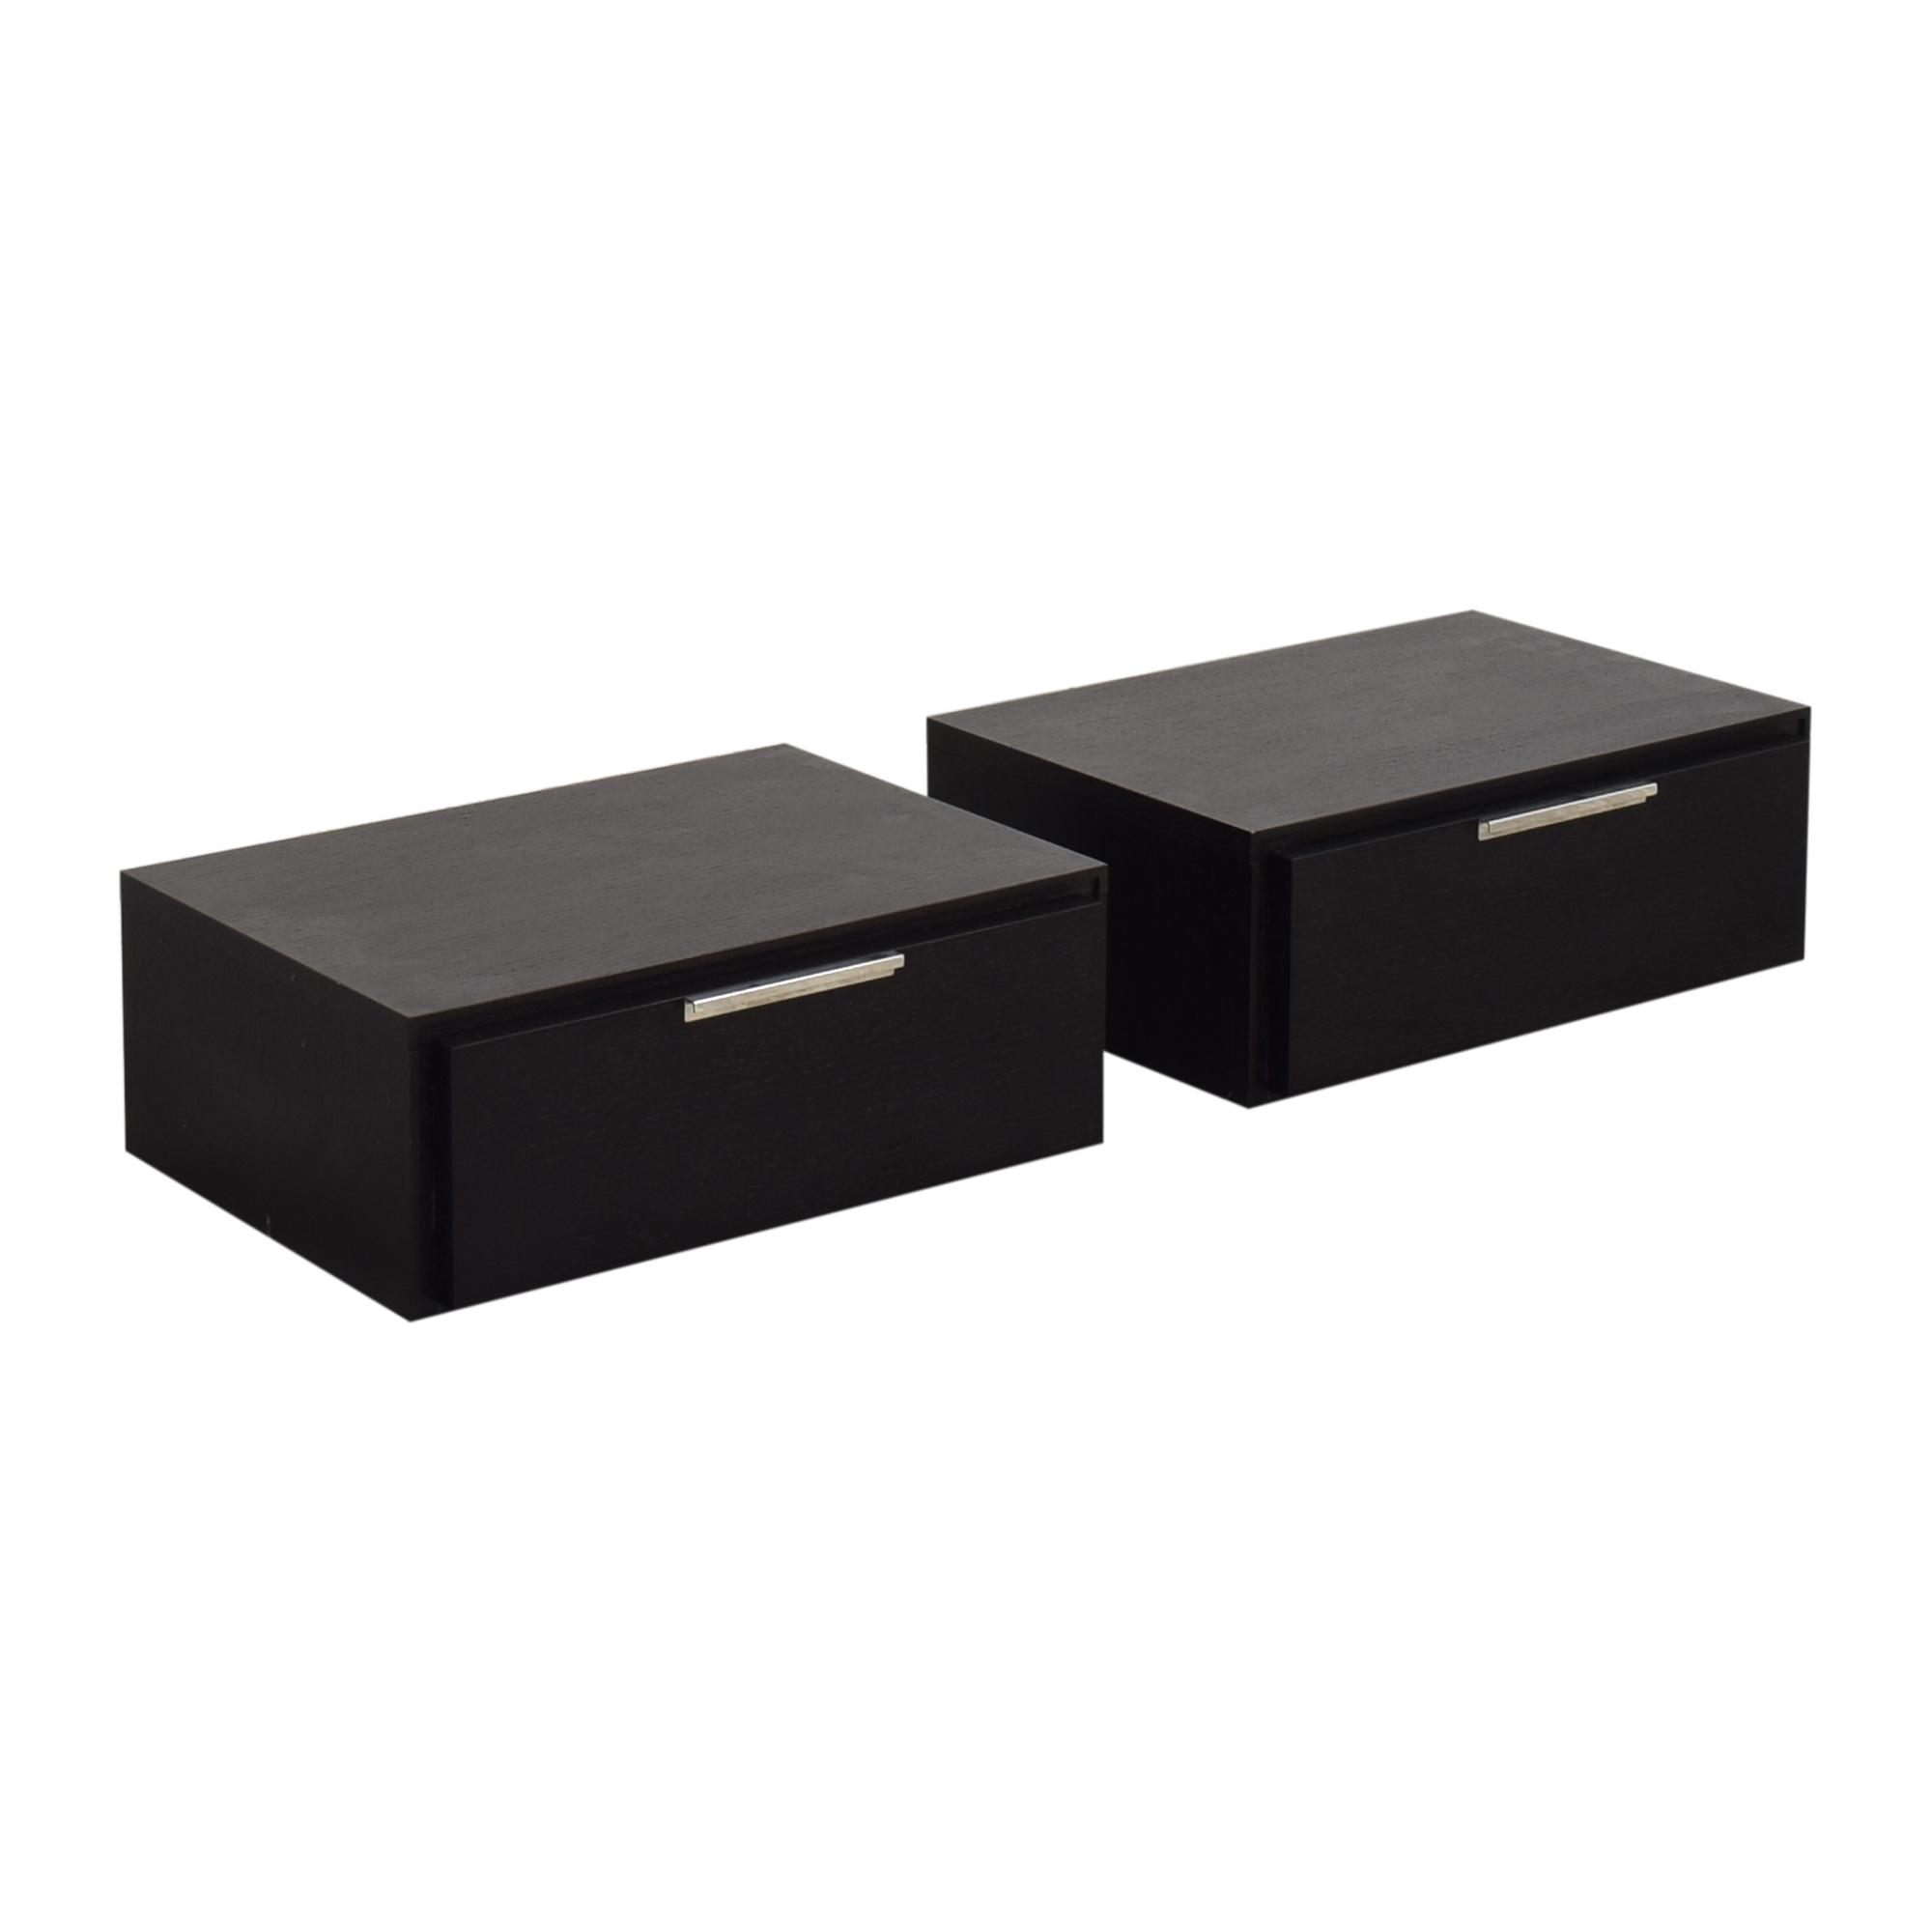 Modloft Thomspon Two-Drawer Nightstands / Tables